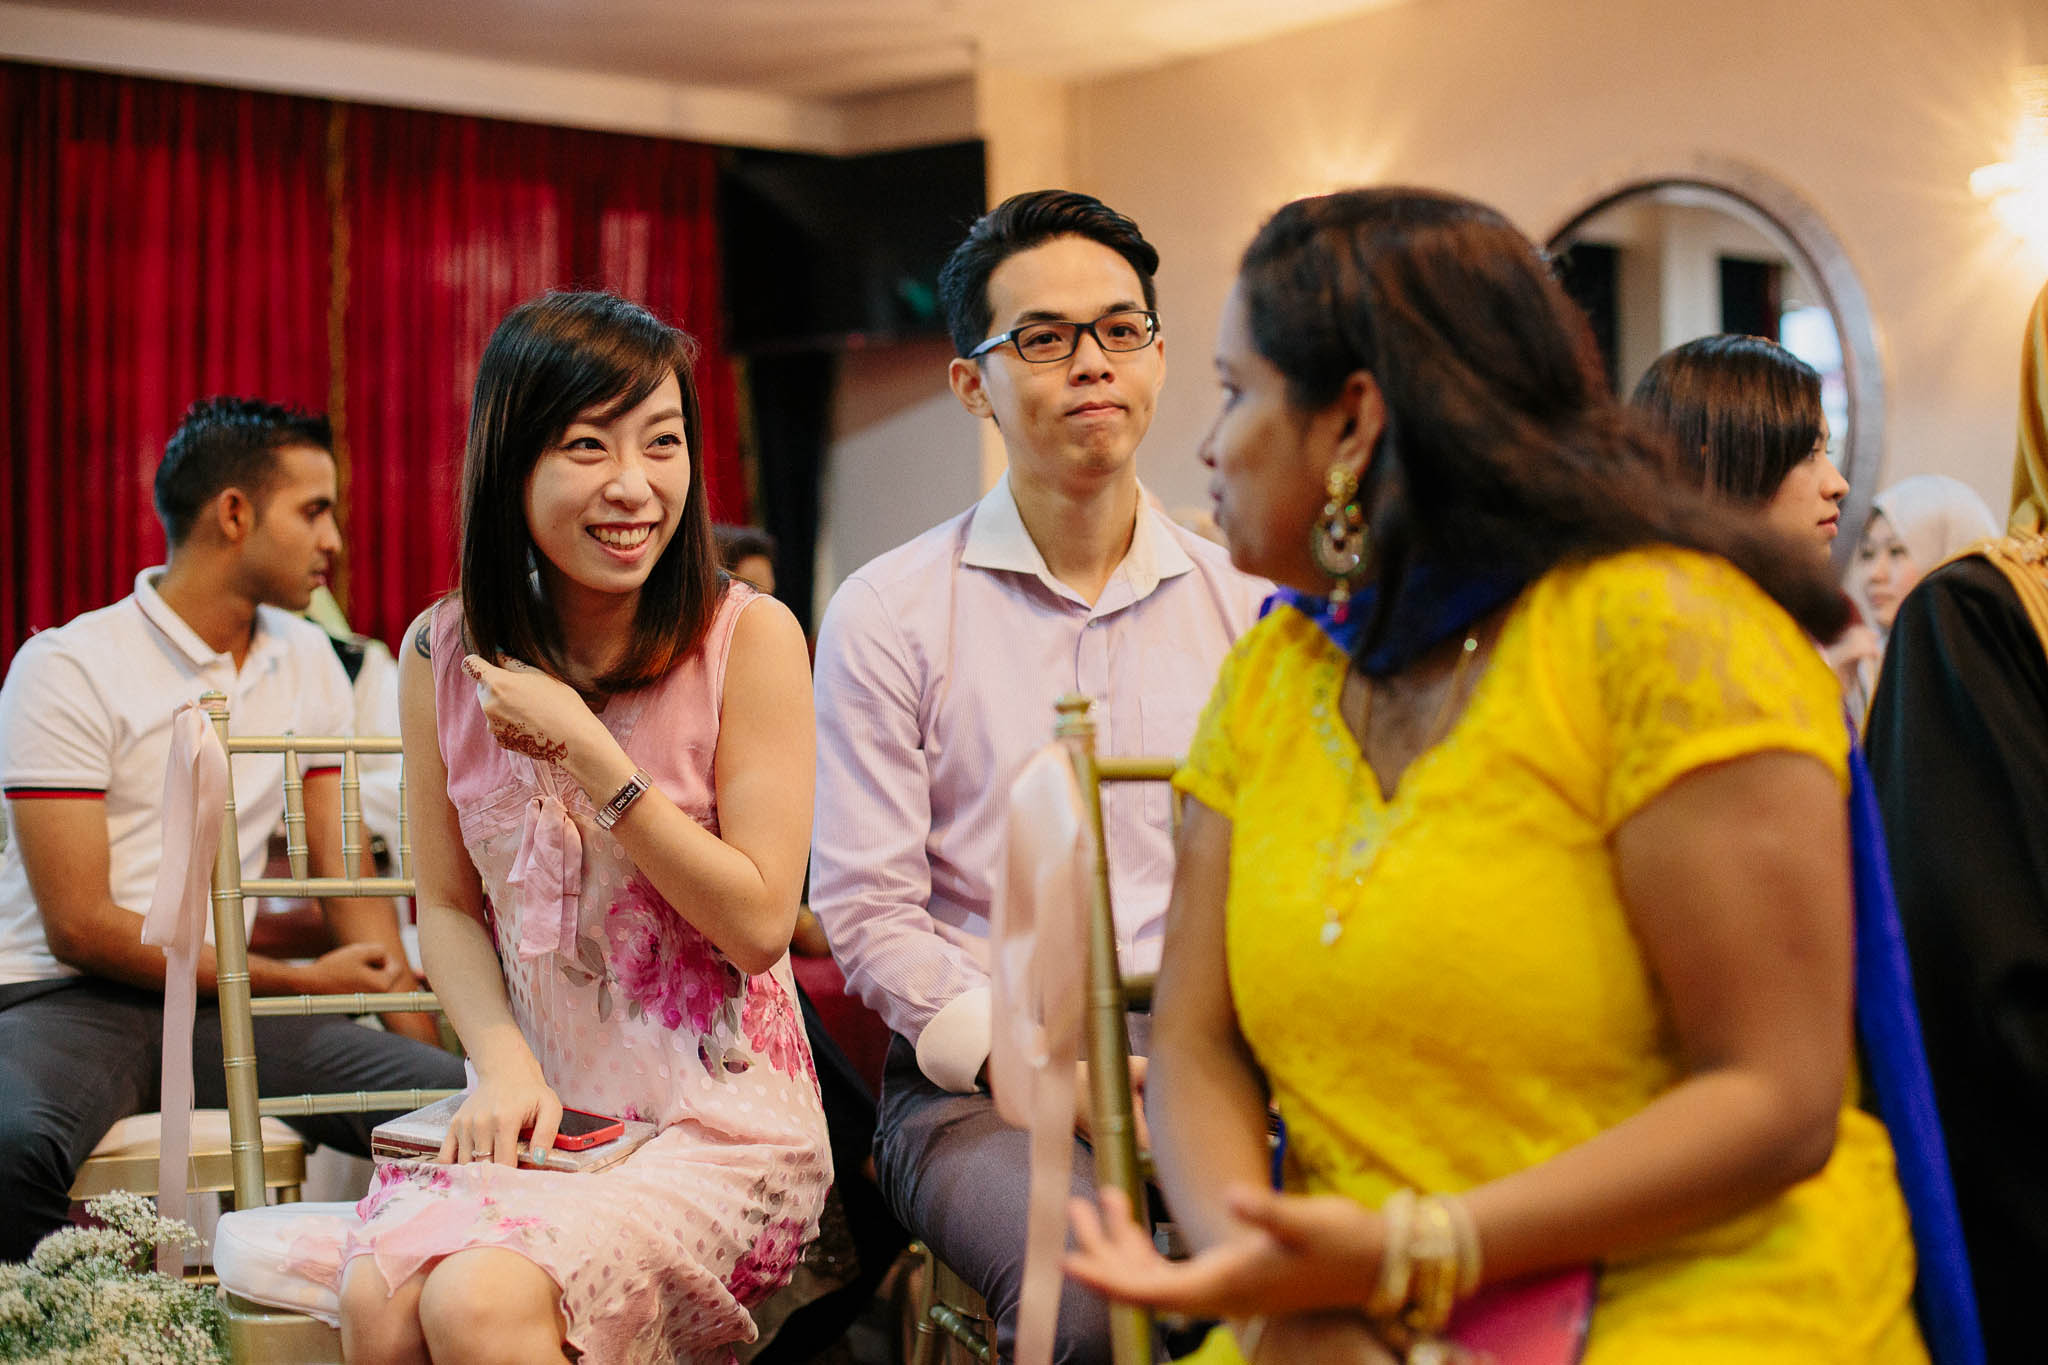 singapore-wedding-photographer-malay-indian-pre-wedding-travel-wmt-2015-shereen-farid-21.jpg